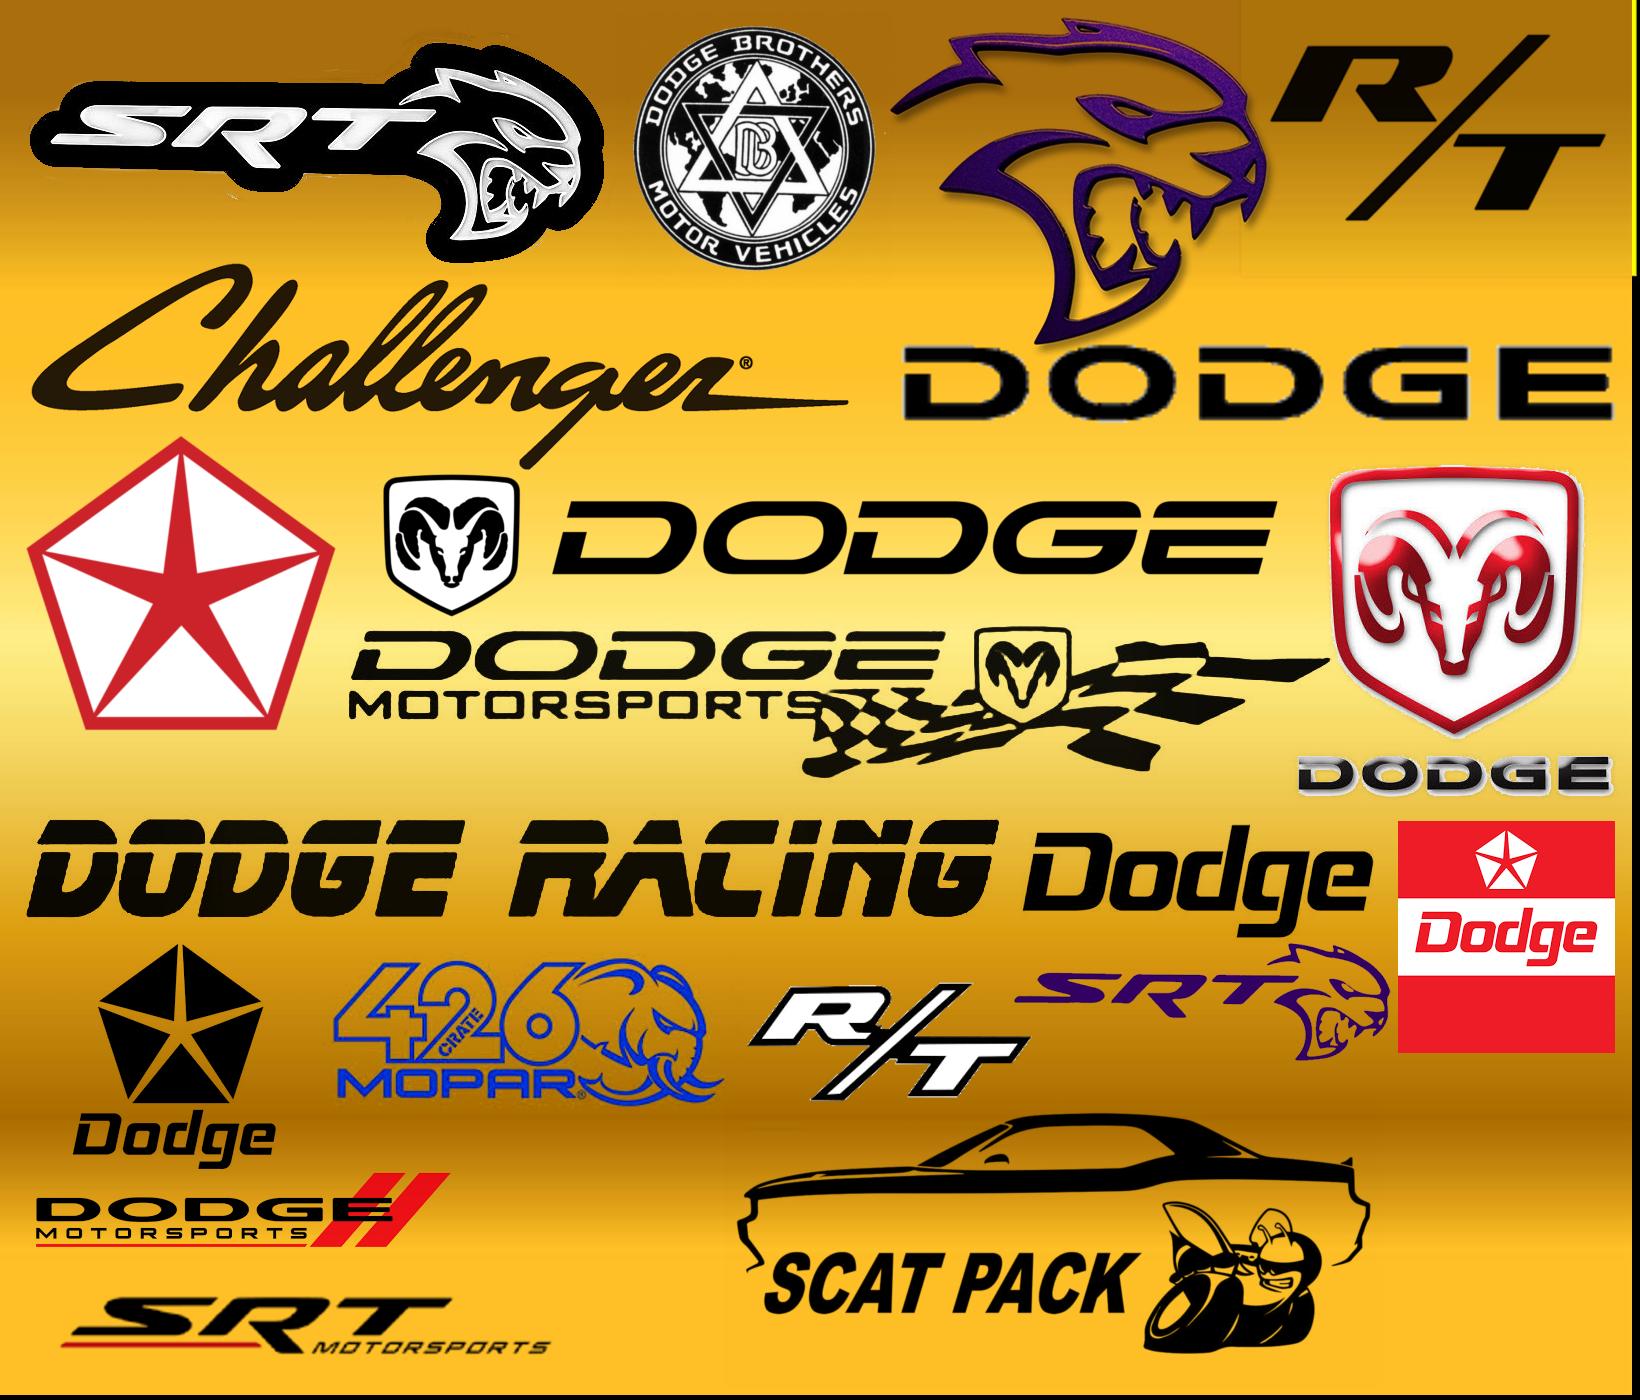 Dodge Challenger logos.png